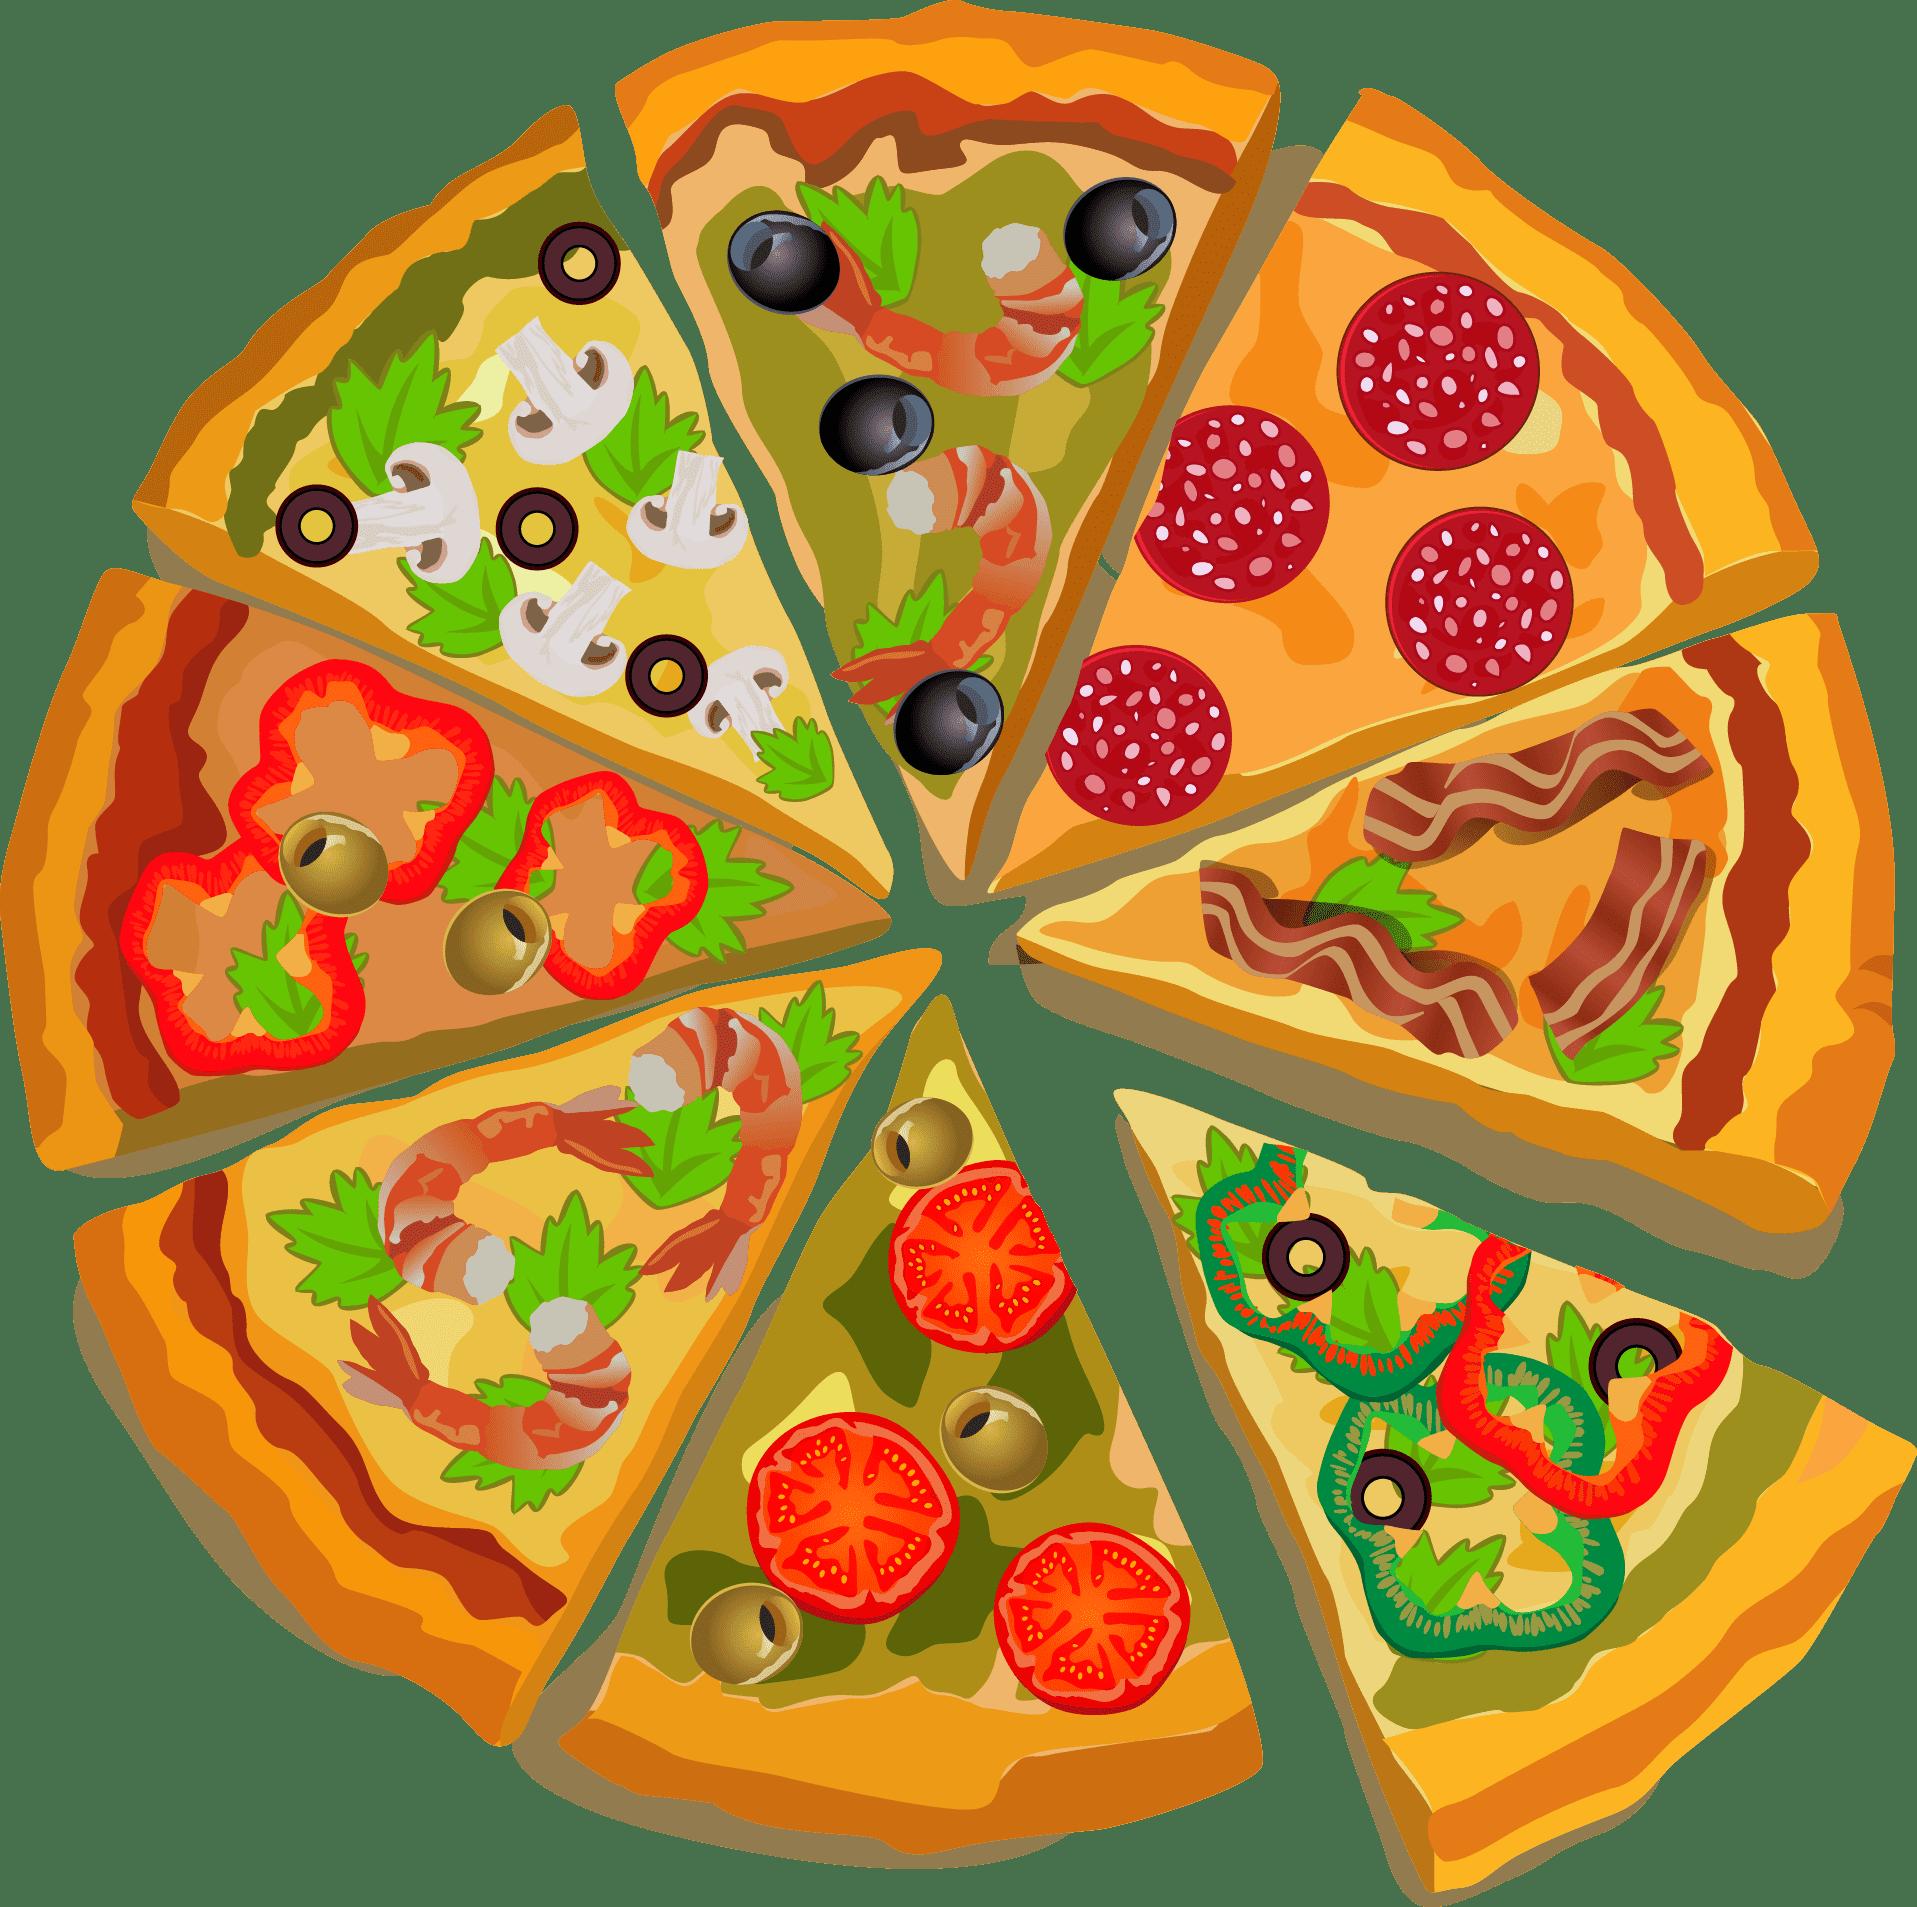 Pizza Slice Images Pizza Sicilian Pizza Italian Cuisine Cuisine Fast Food Free Png Images Arte De Pizza Vetor De Pizza Ideias Para Restaurantes